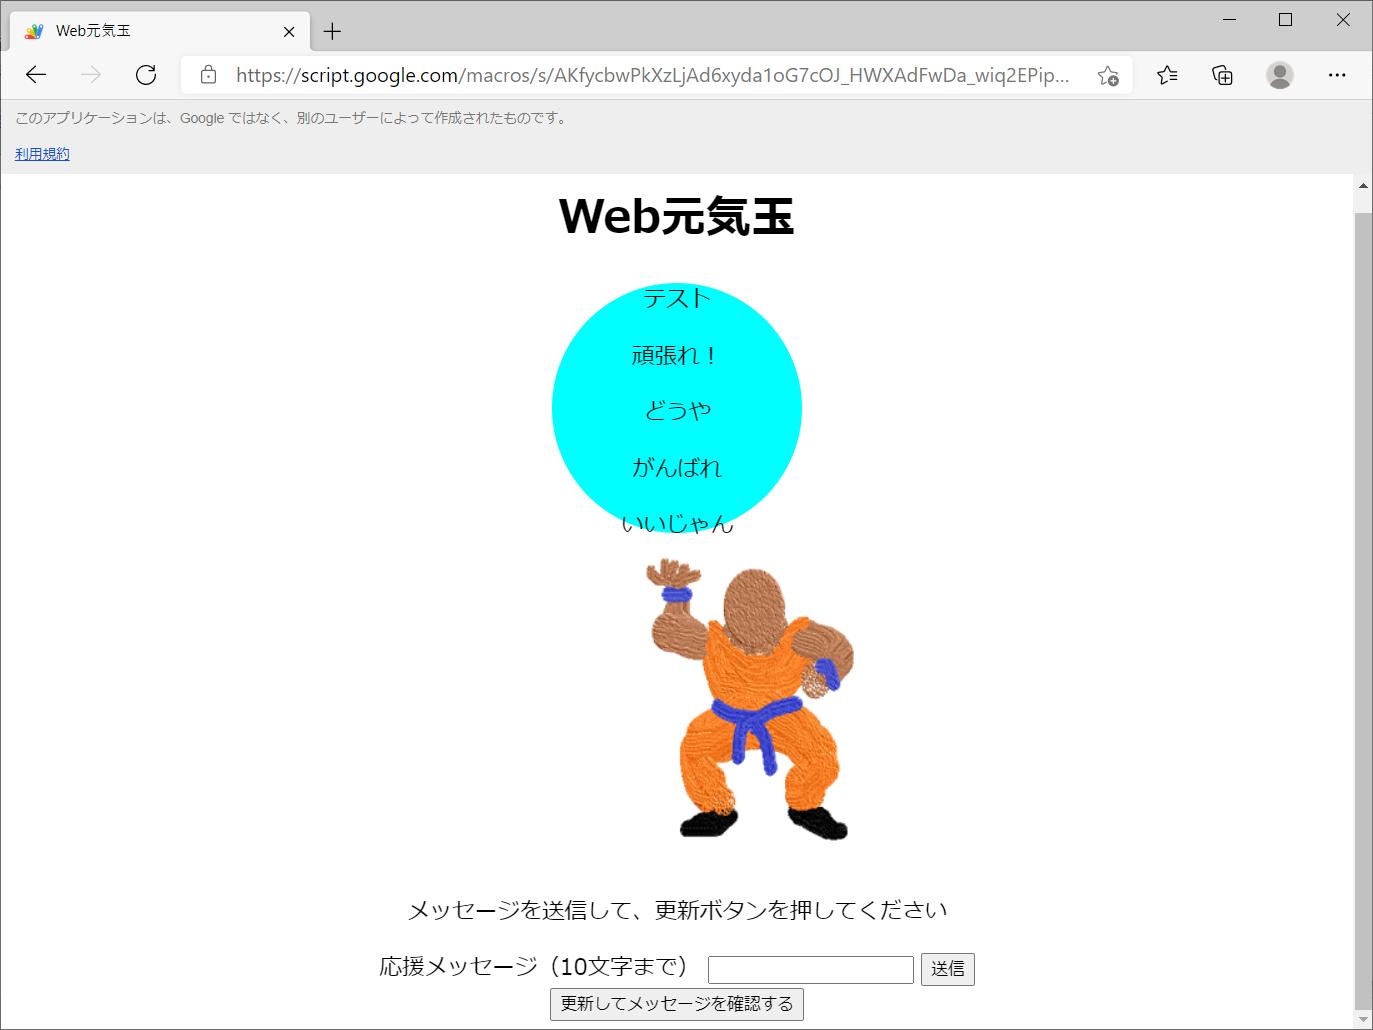 【Web】1週間でWebサービスを作るイベントweb1weekお題「増える」の振り返り